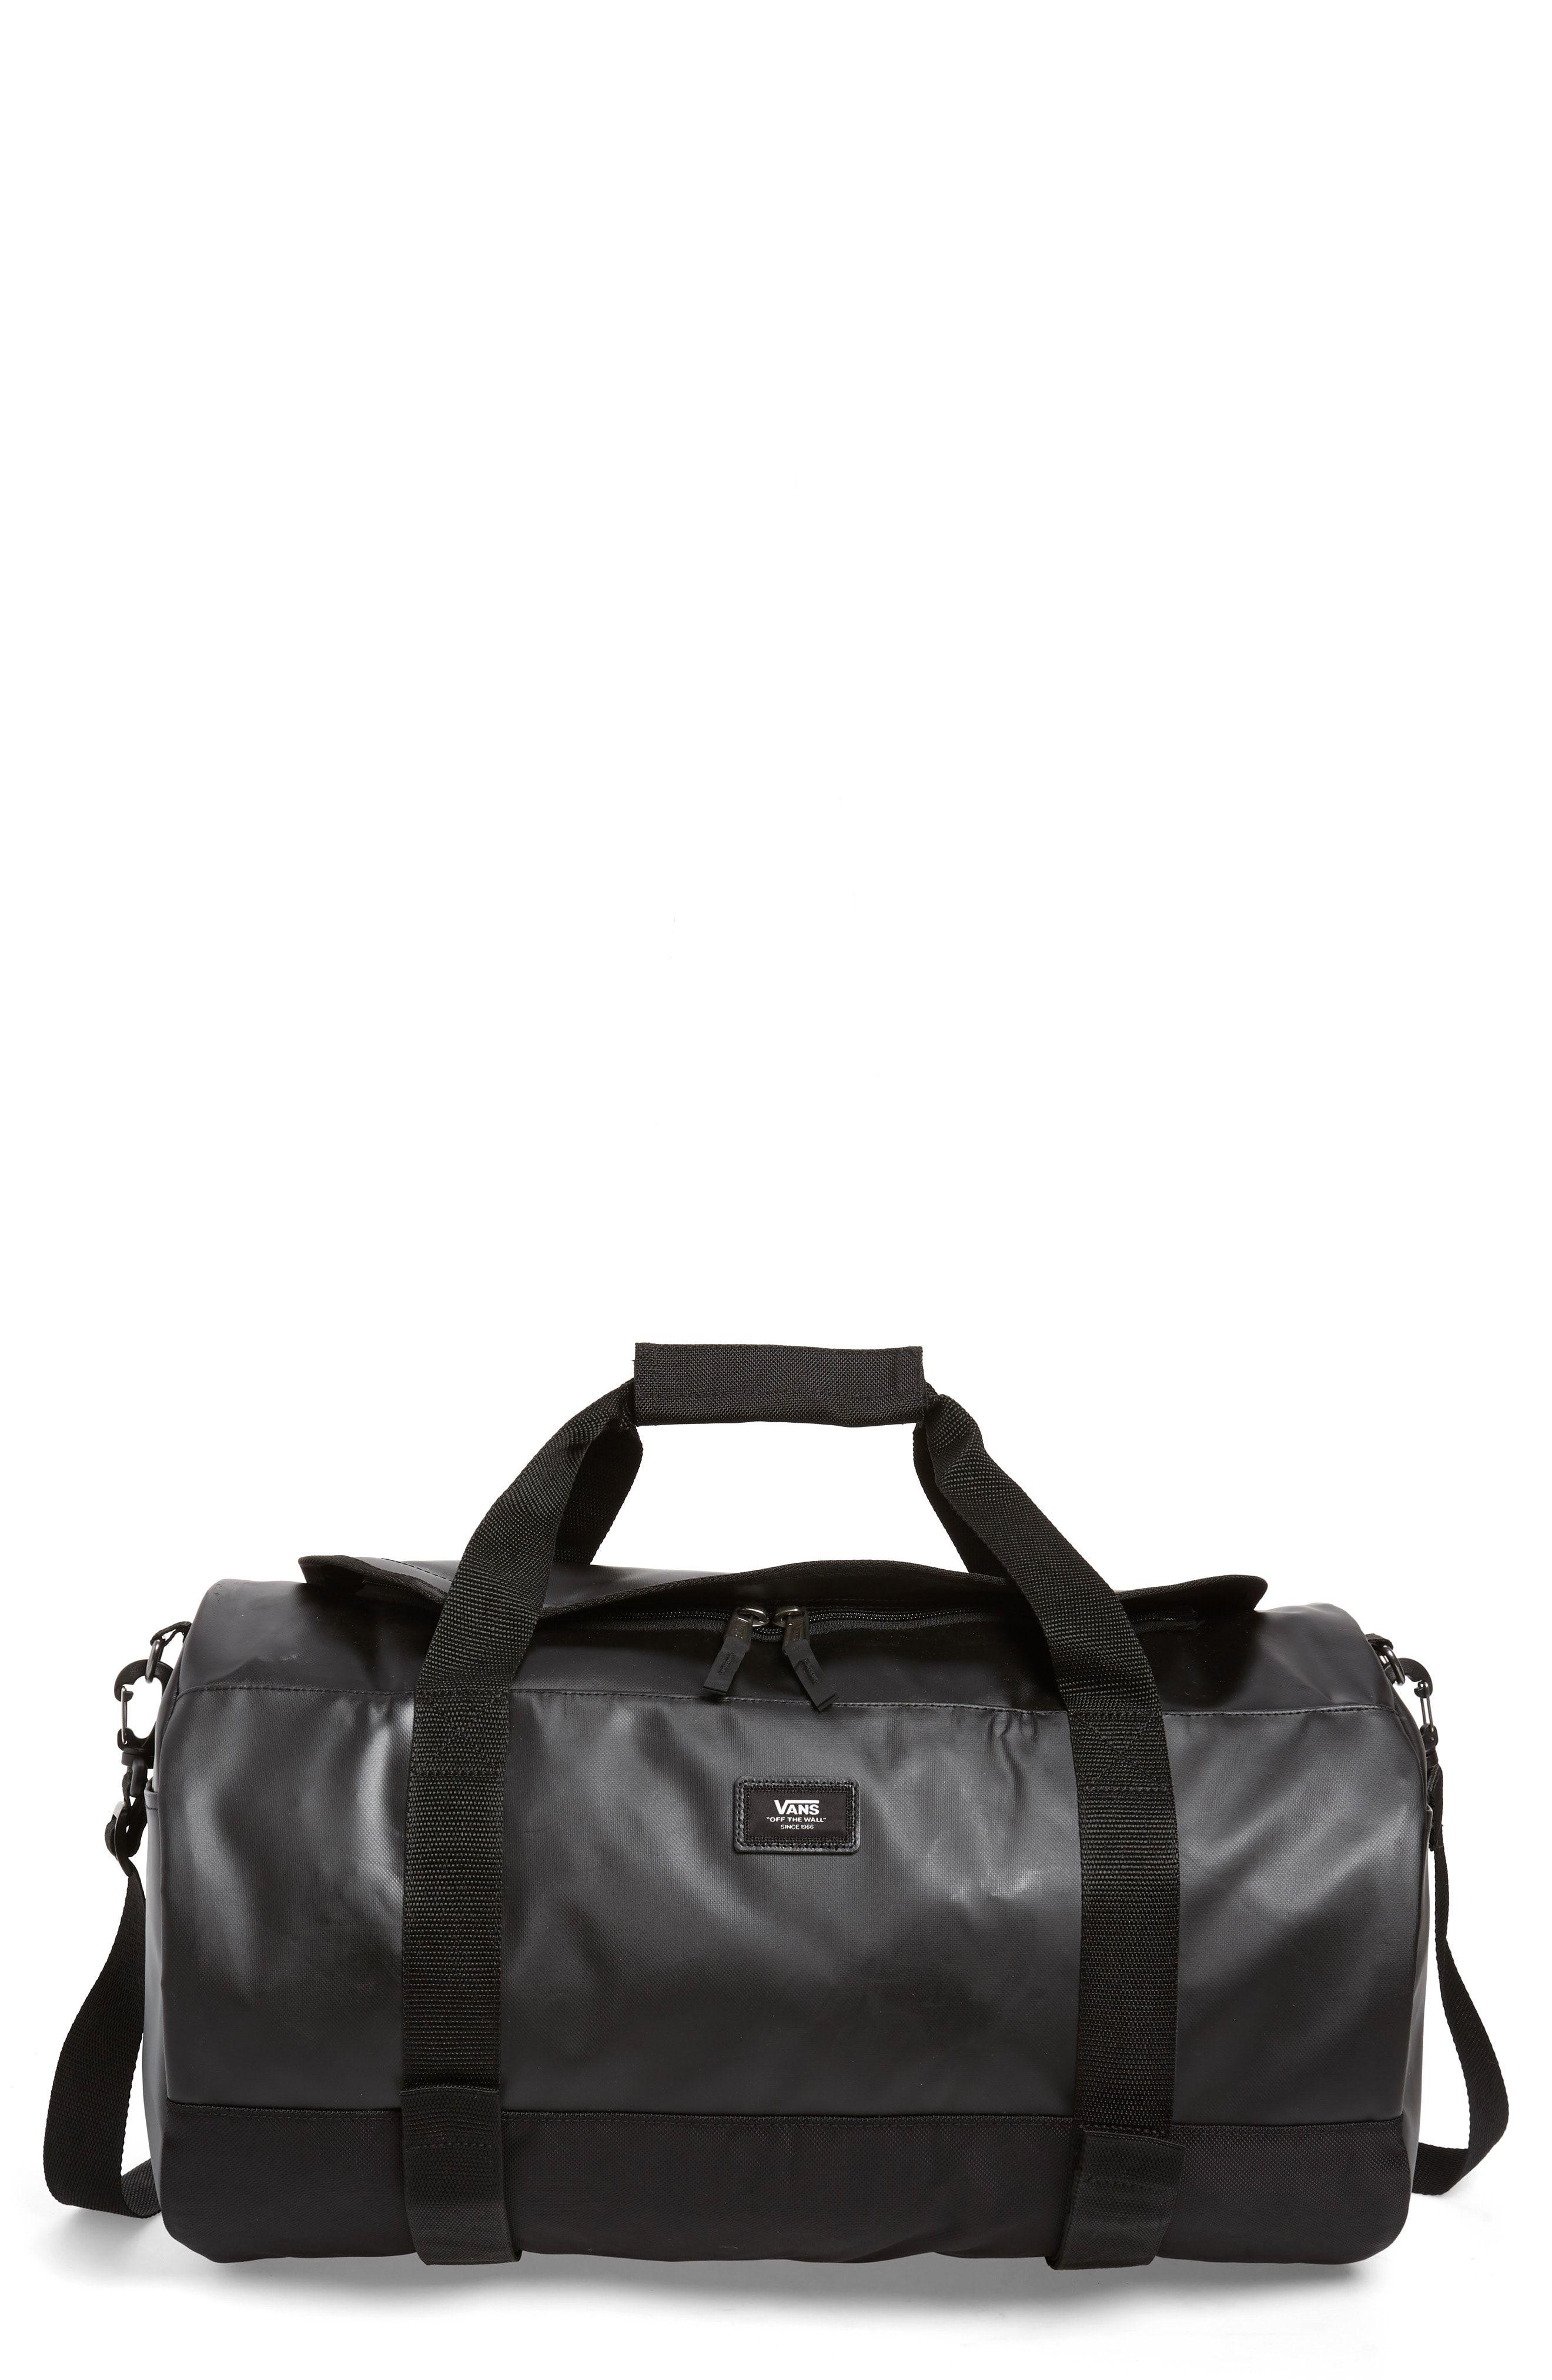 9a1365b36e VANS GRIND SKATE WATER RESISTANT DUFFEL BAG - BLACK.  vans  bags  shoulder  bags  lace